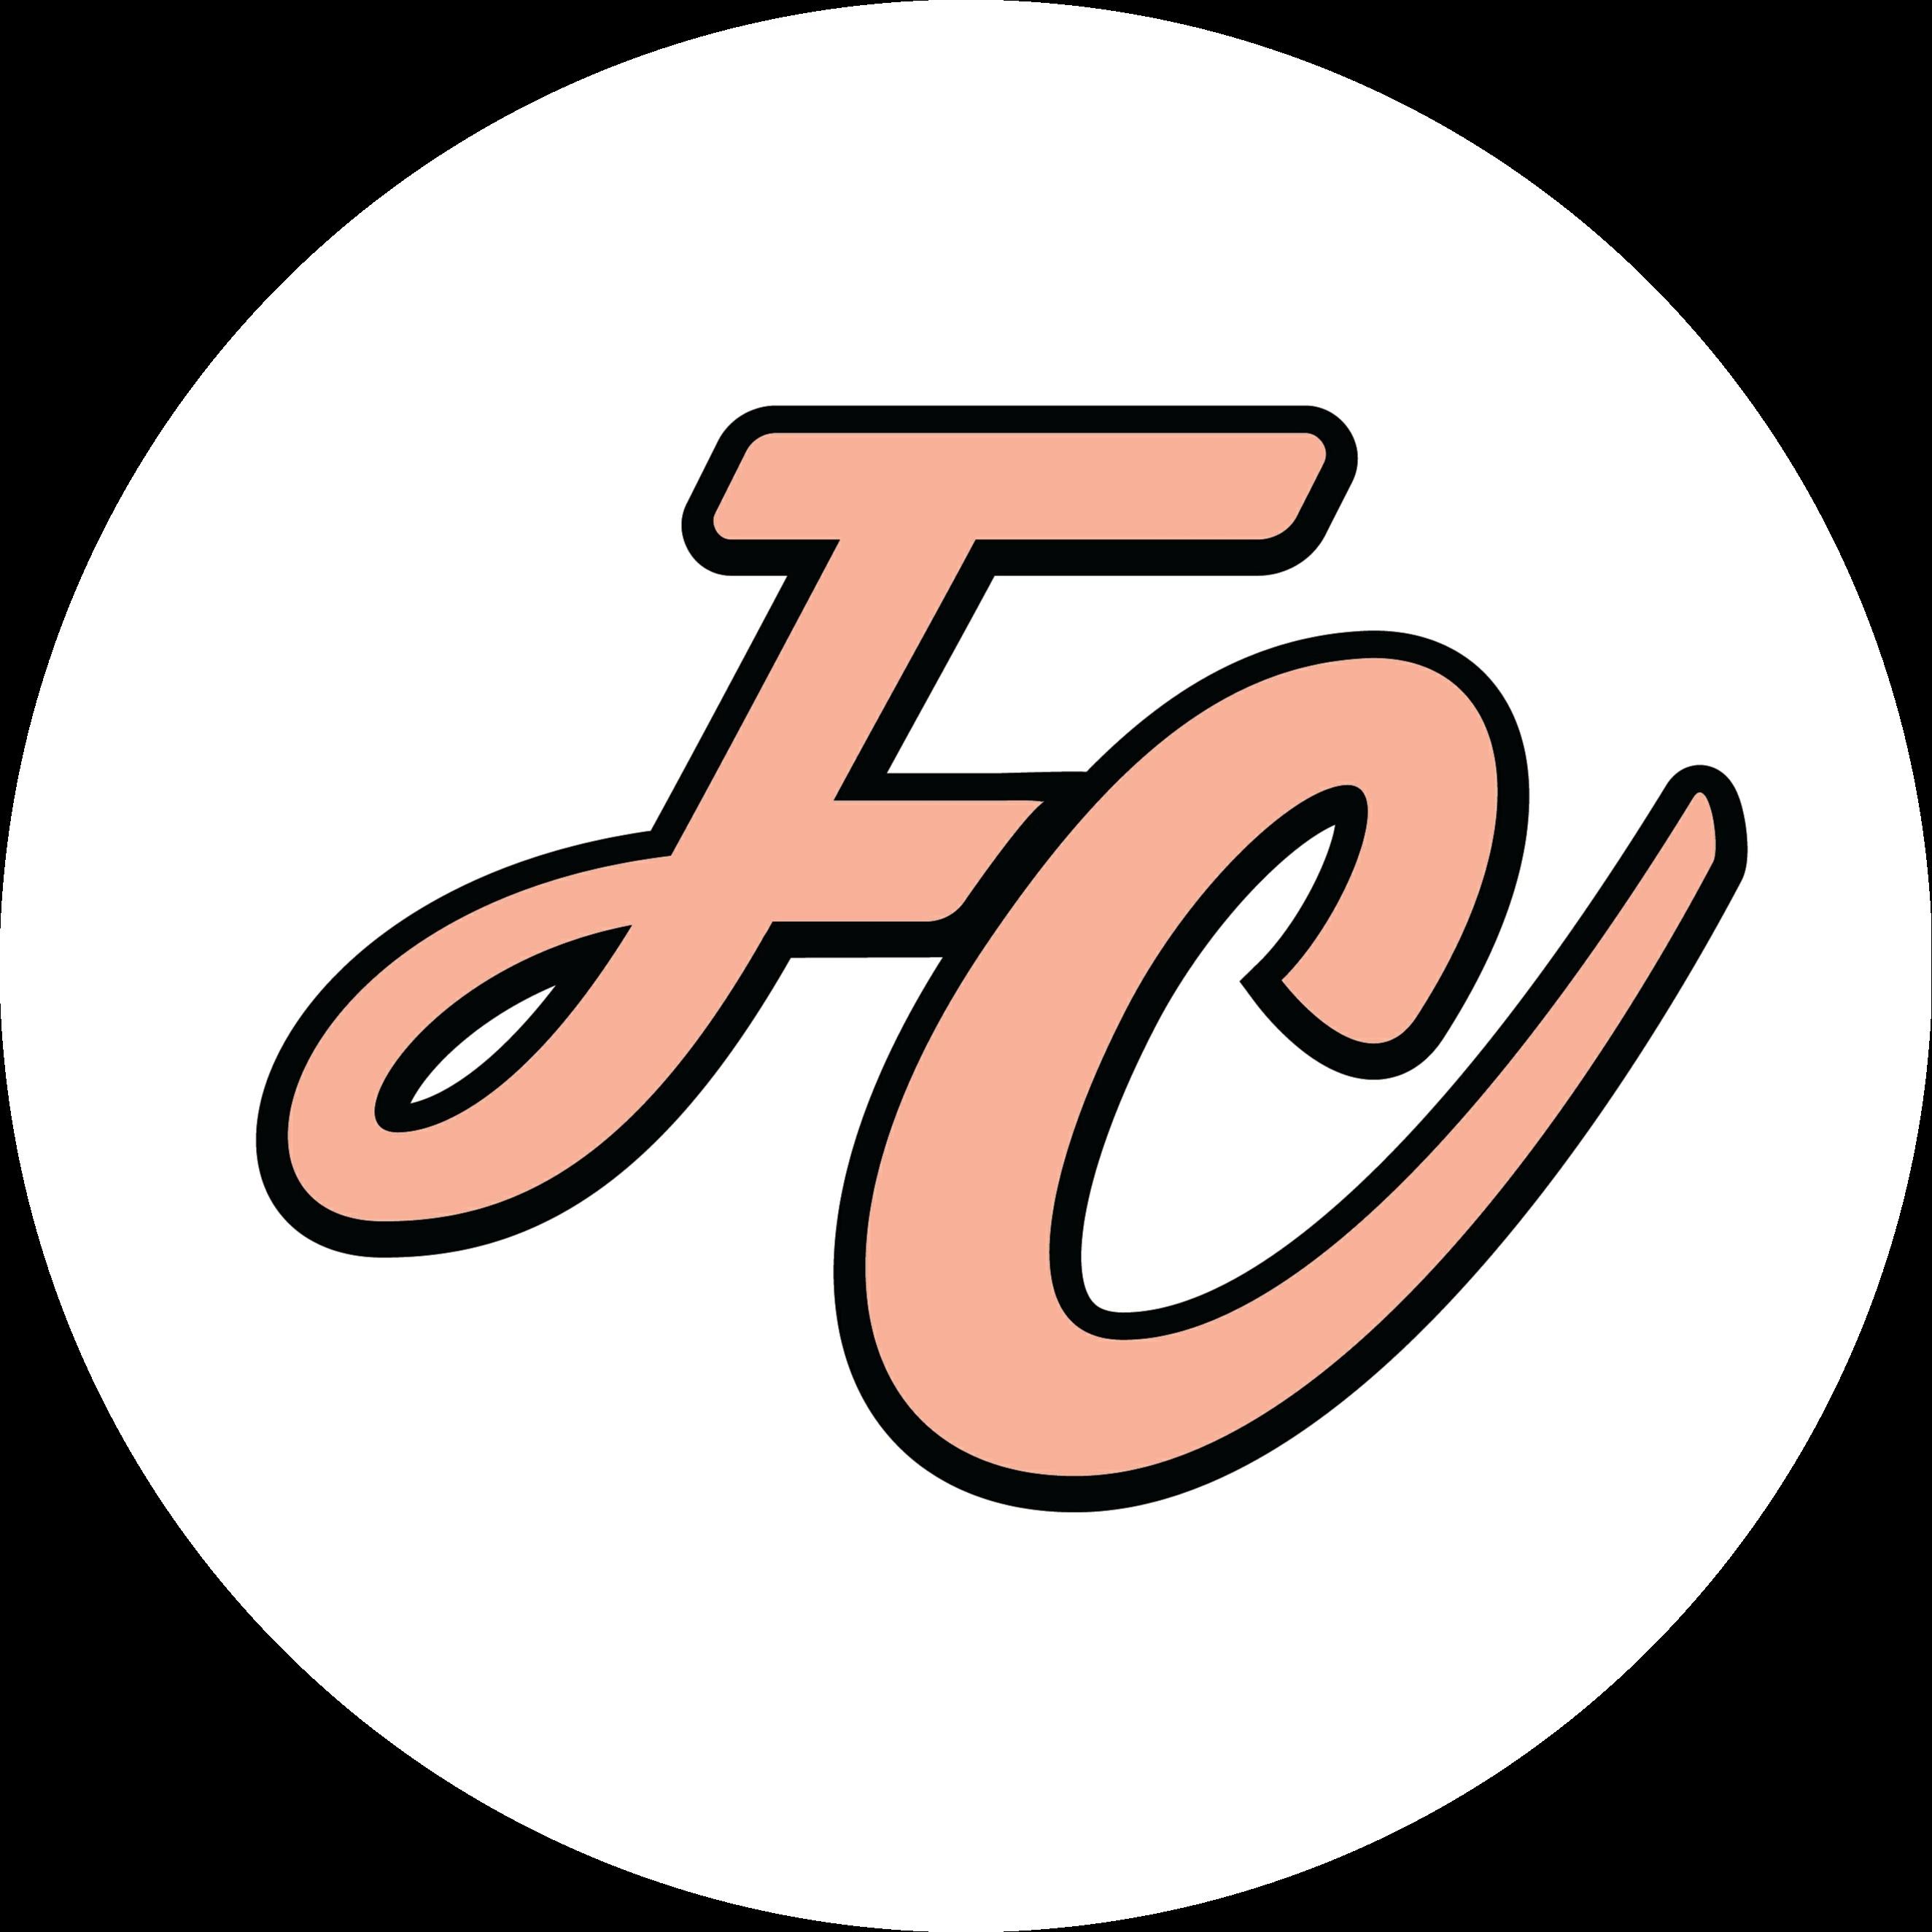 @flightclubva Profile Image | Linktree